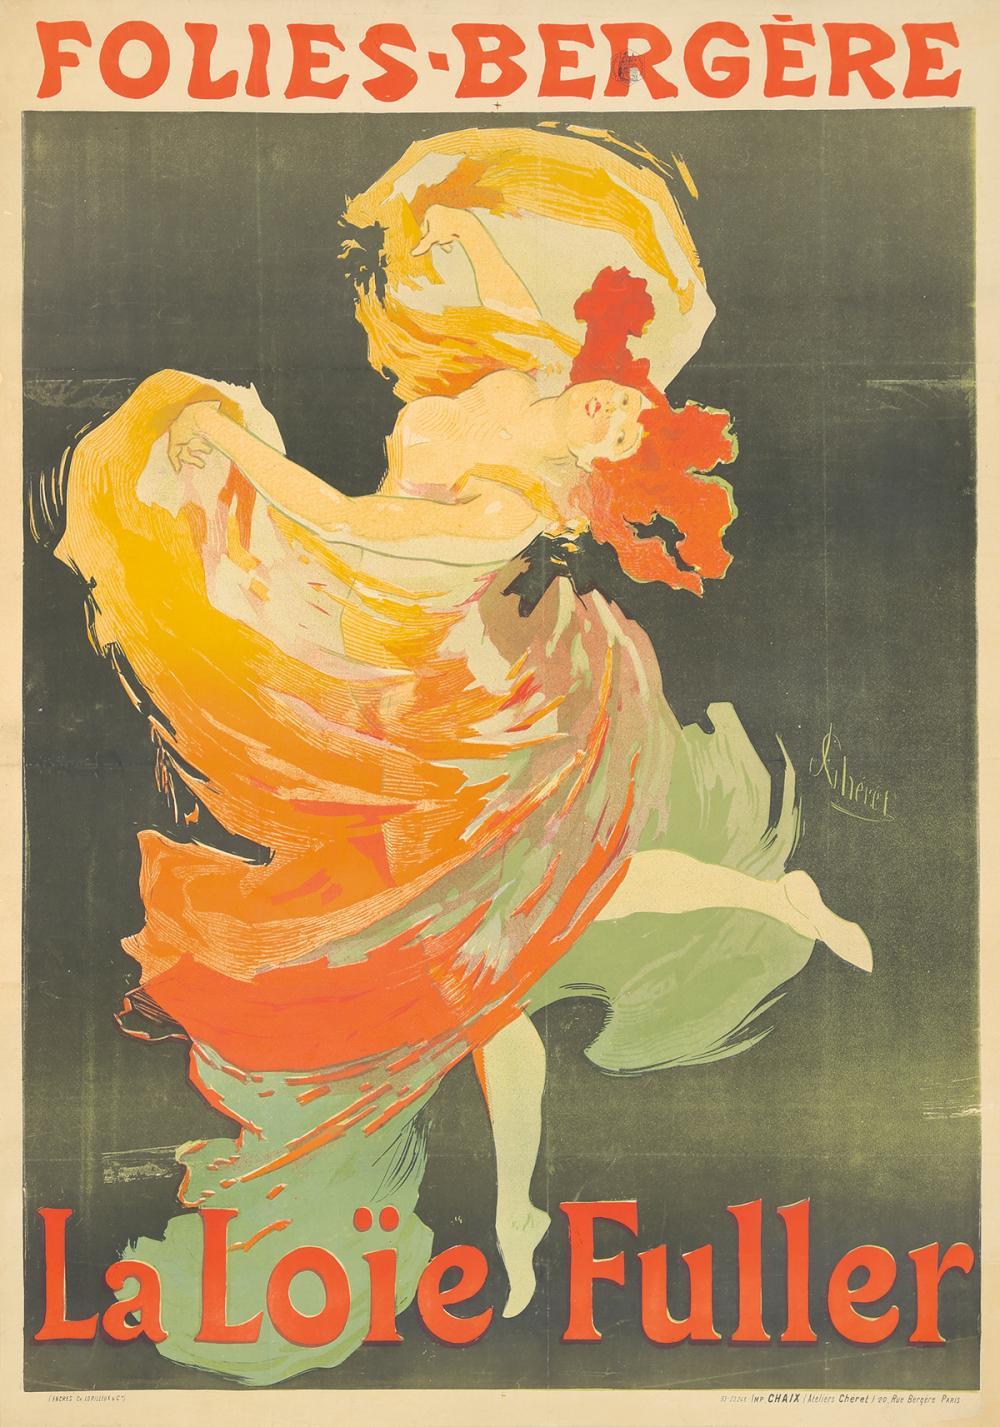 Folies-Bergère / La Loïe Fuller. 1893.